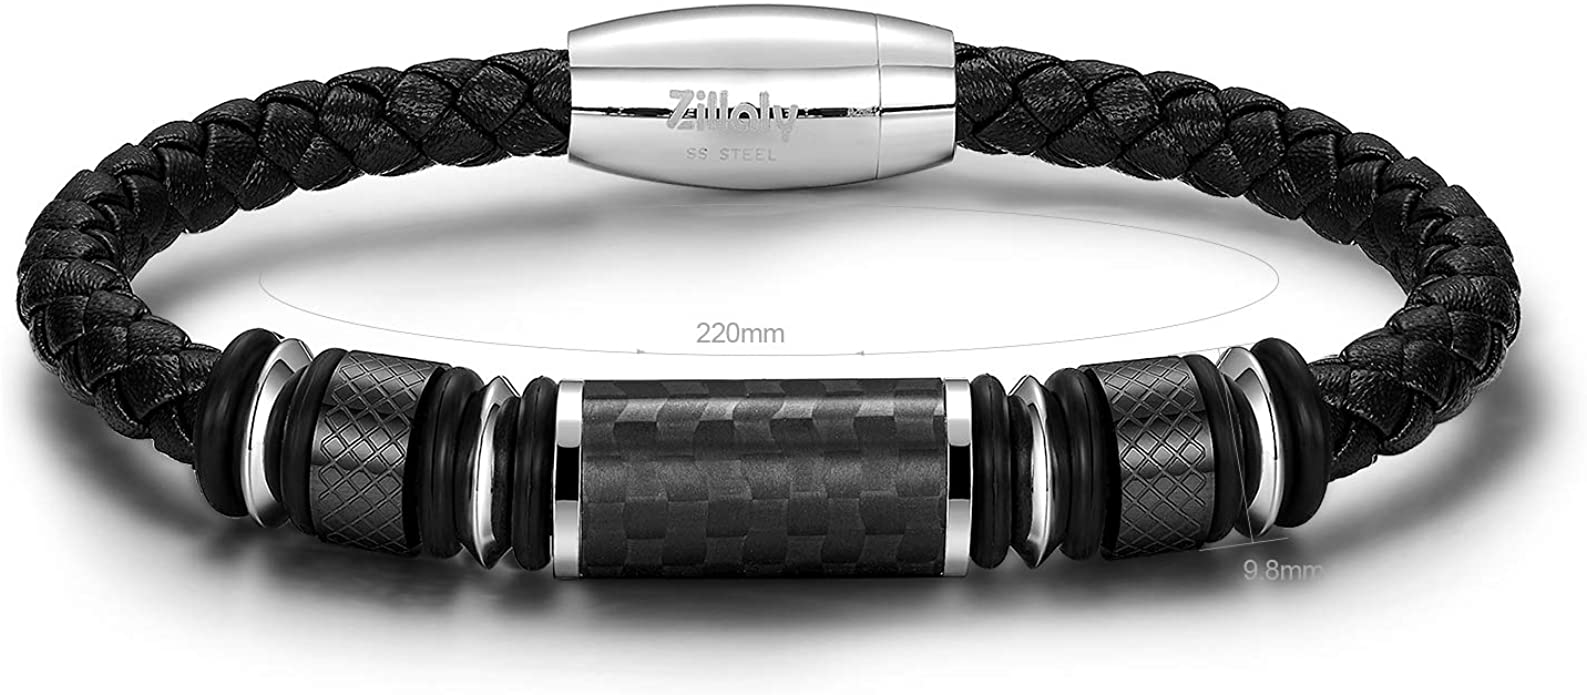 Adjustable Wristband | Handmade Silver Bracelet Zultanite Bracelet Colour Changing 925 Silver 18 CM Water Line Wristband